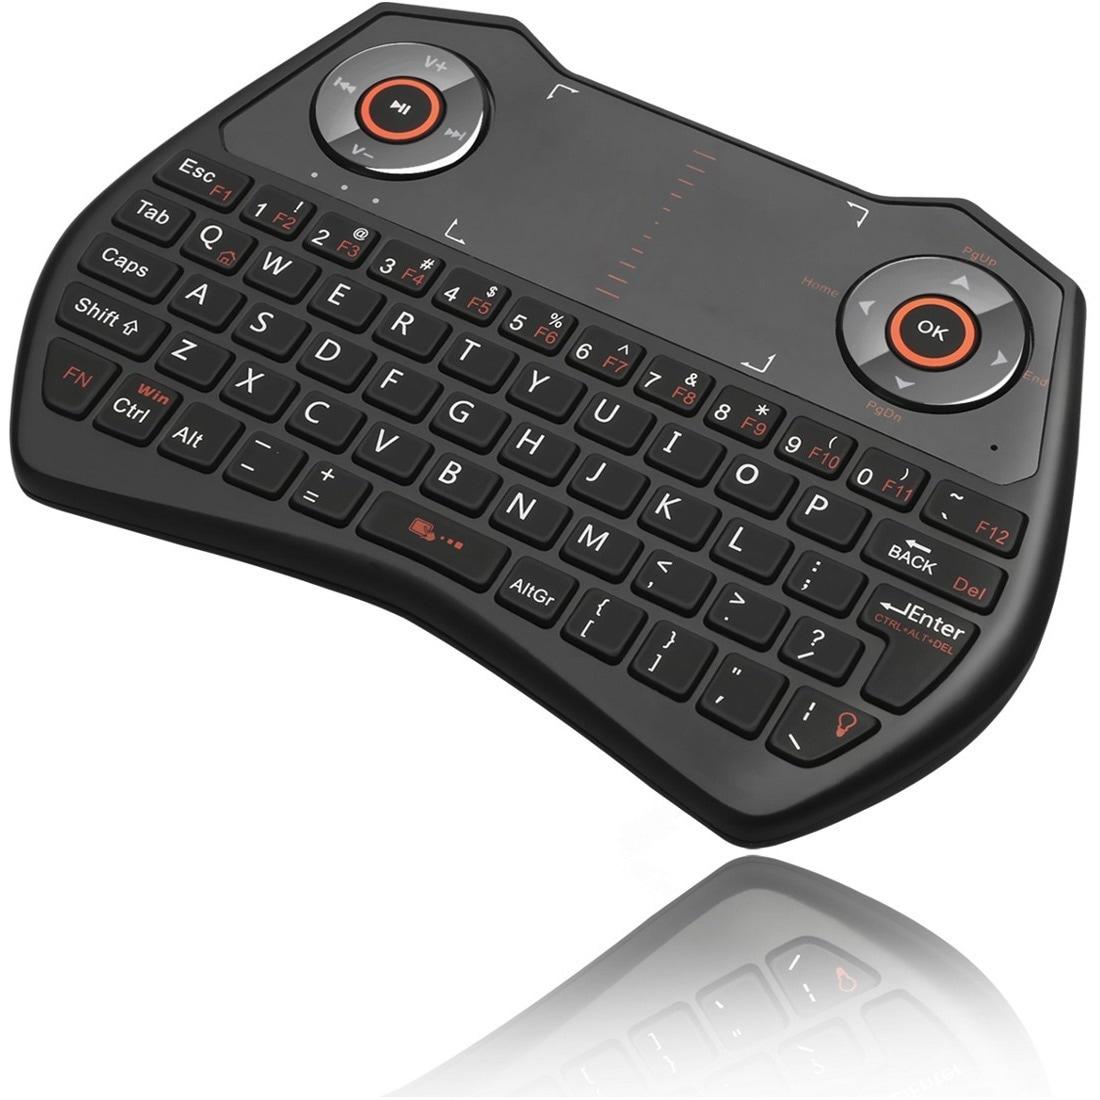 Adesso SlimTouch 4020 - 2.4GHz Wireless Keyboard with Tou...